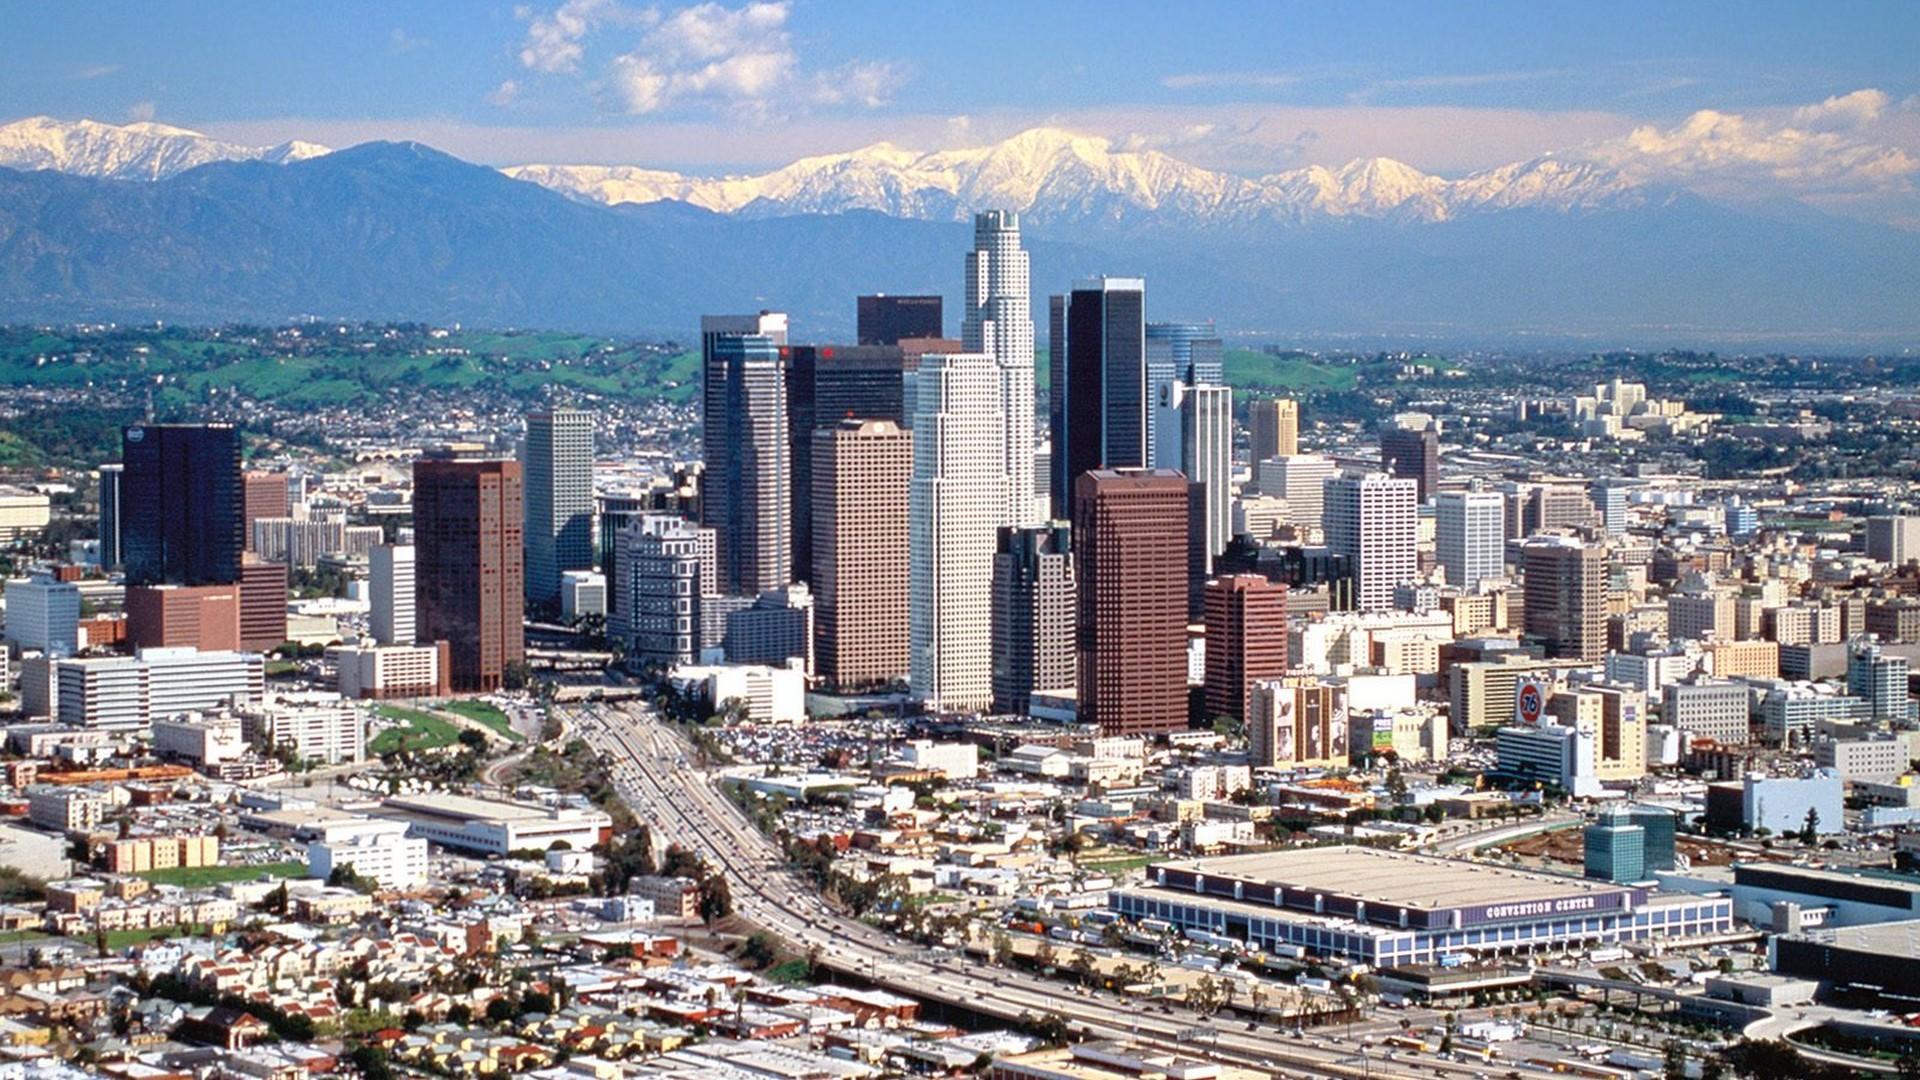 Los Angeles - Du lịch Mỹ trọn gói - Vietourist